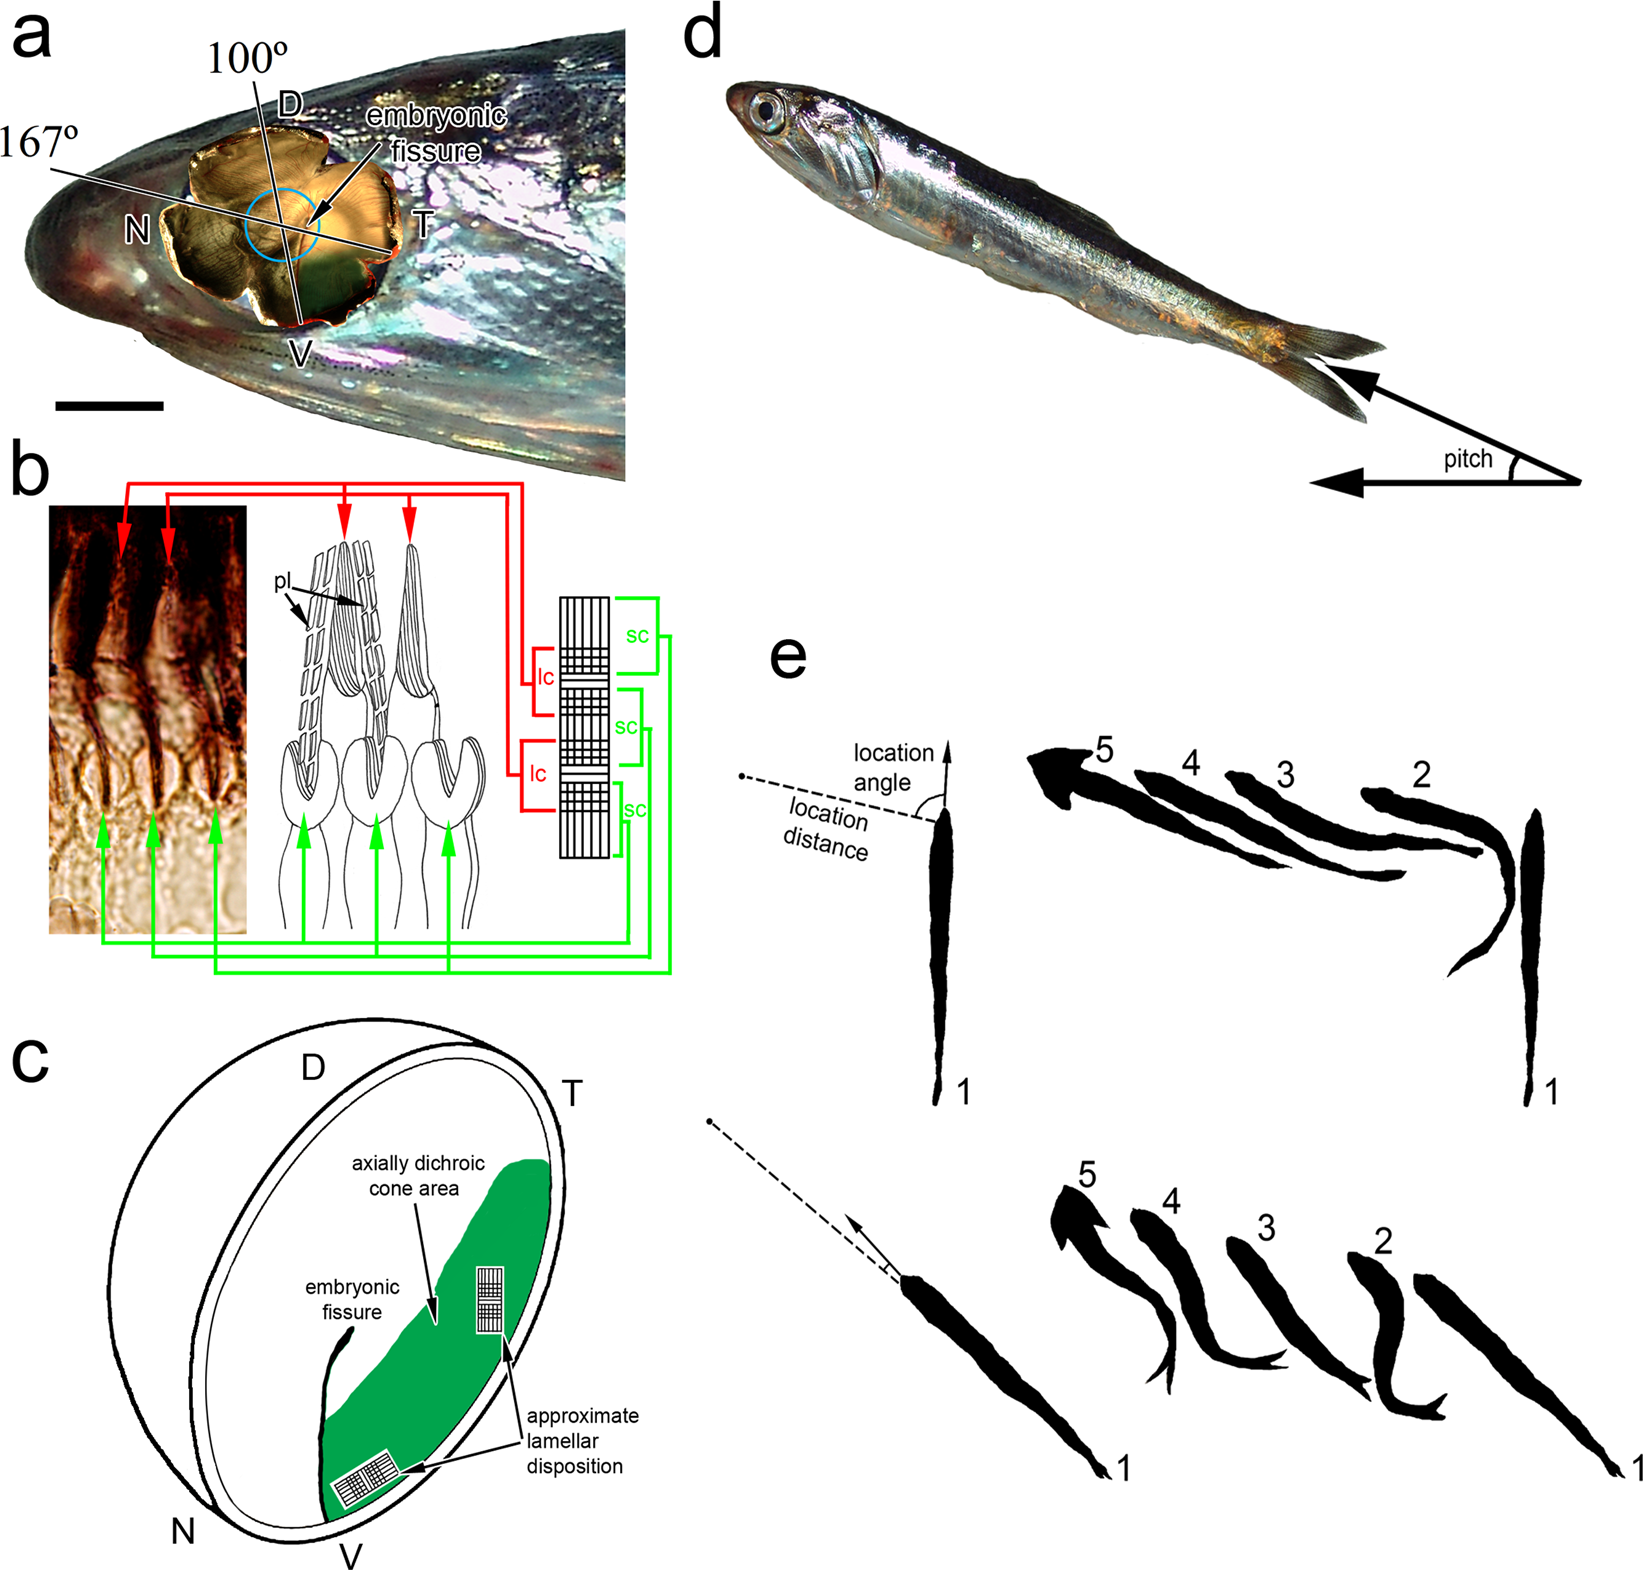 Swimming behaviour tunes fish polarization vision to double